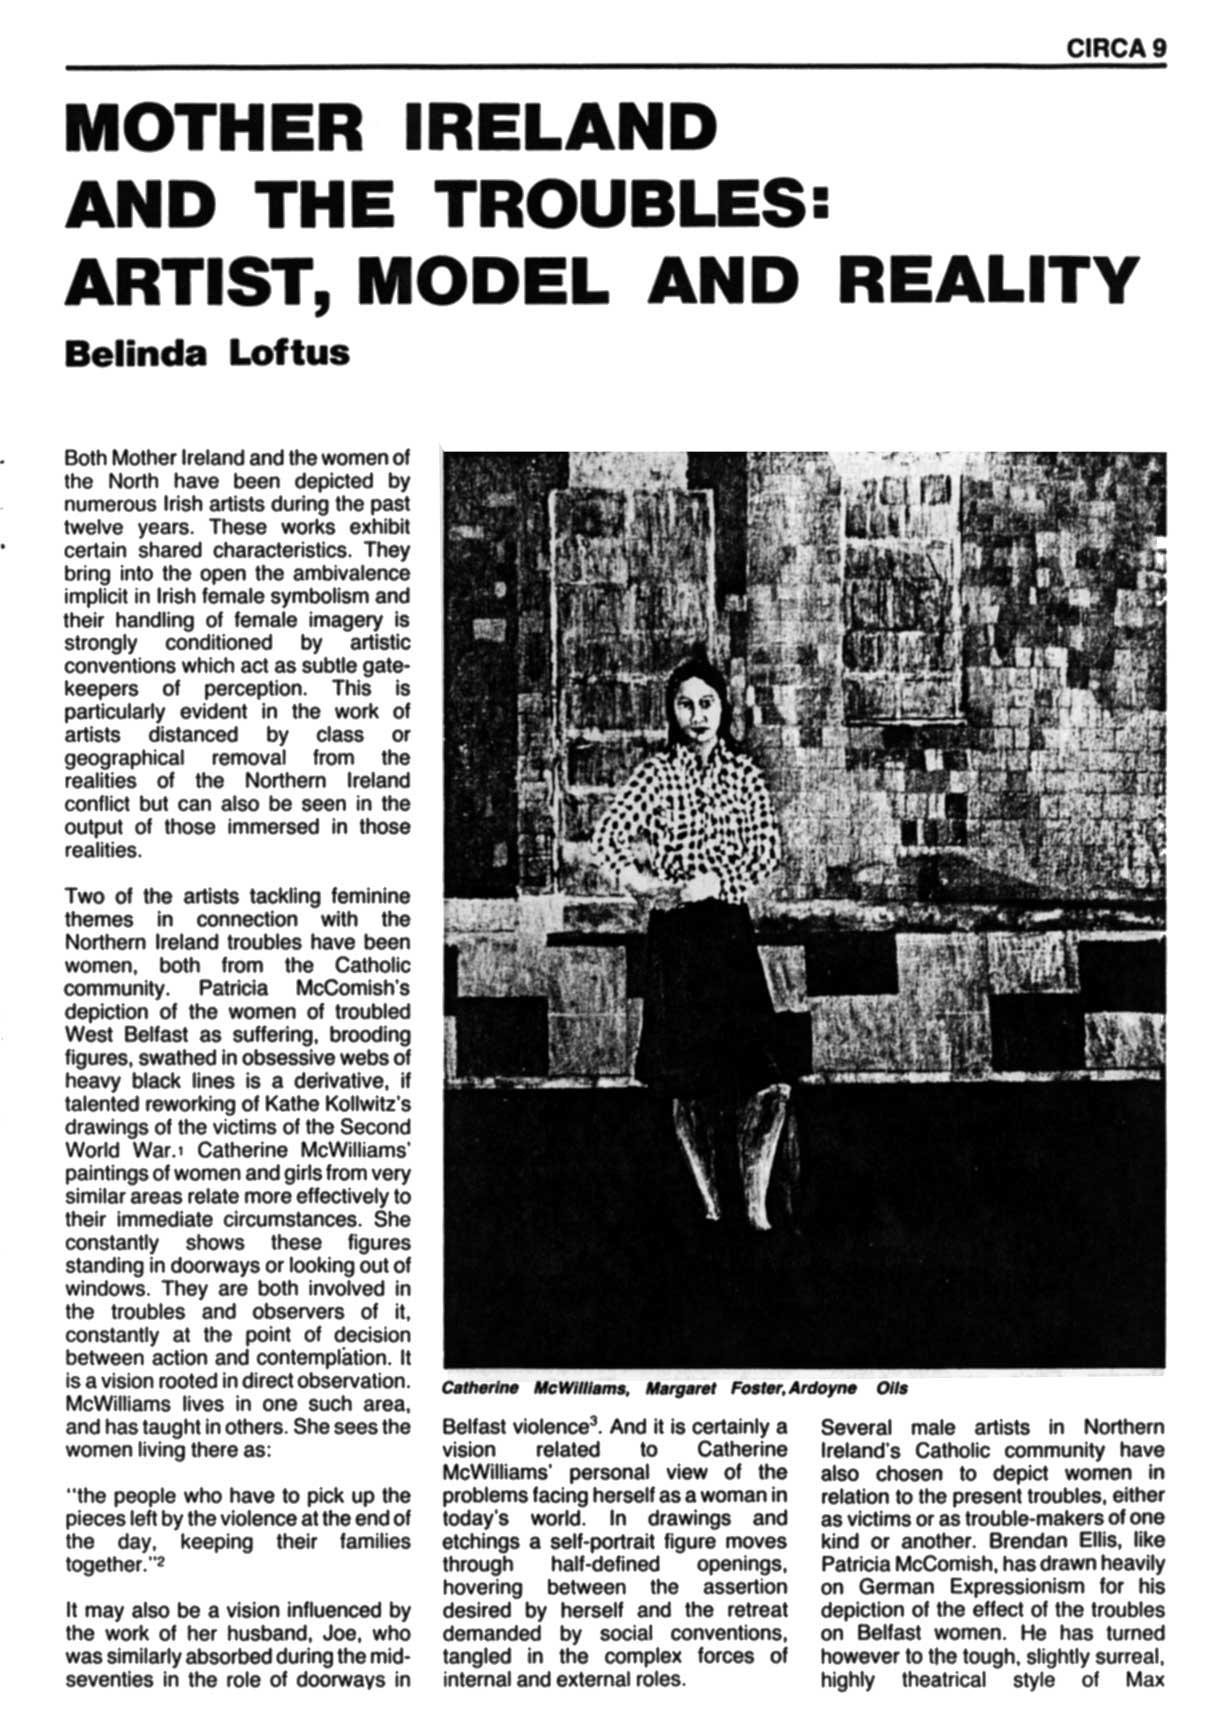 Issue 1: November / December 1981, p. 9